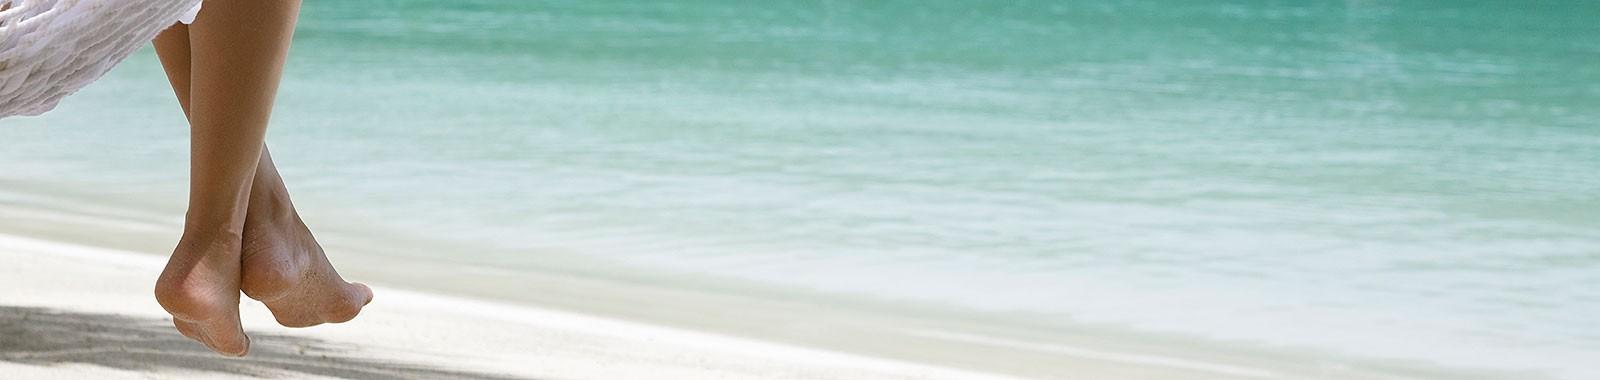 Cairns Psychologist - Seachange Psychology